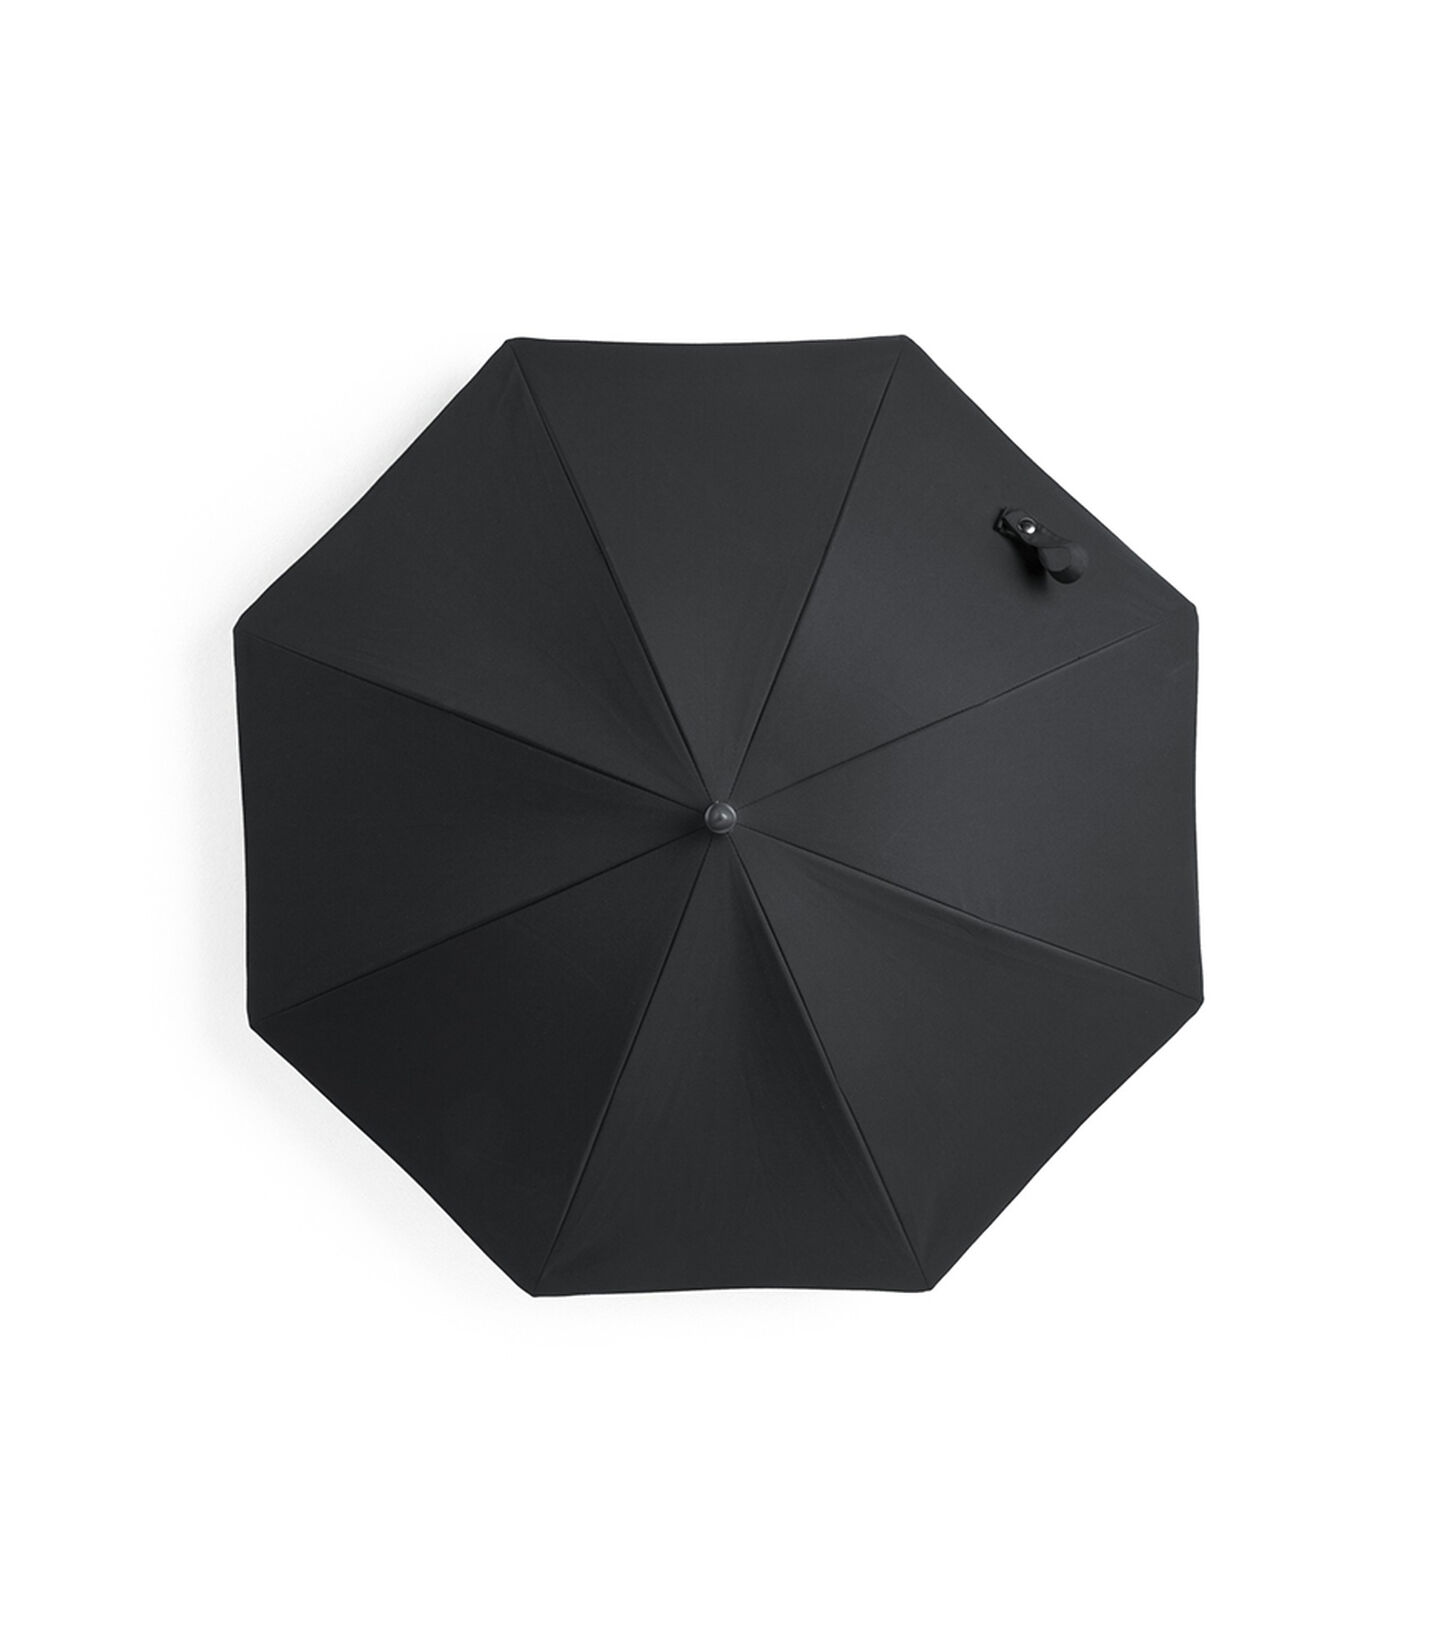 Stokke® Stroller Black Parasol Black, Black, mainview view 2